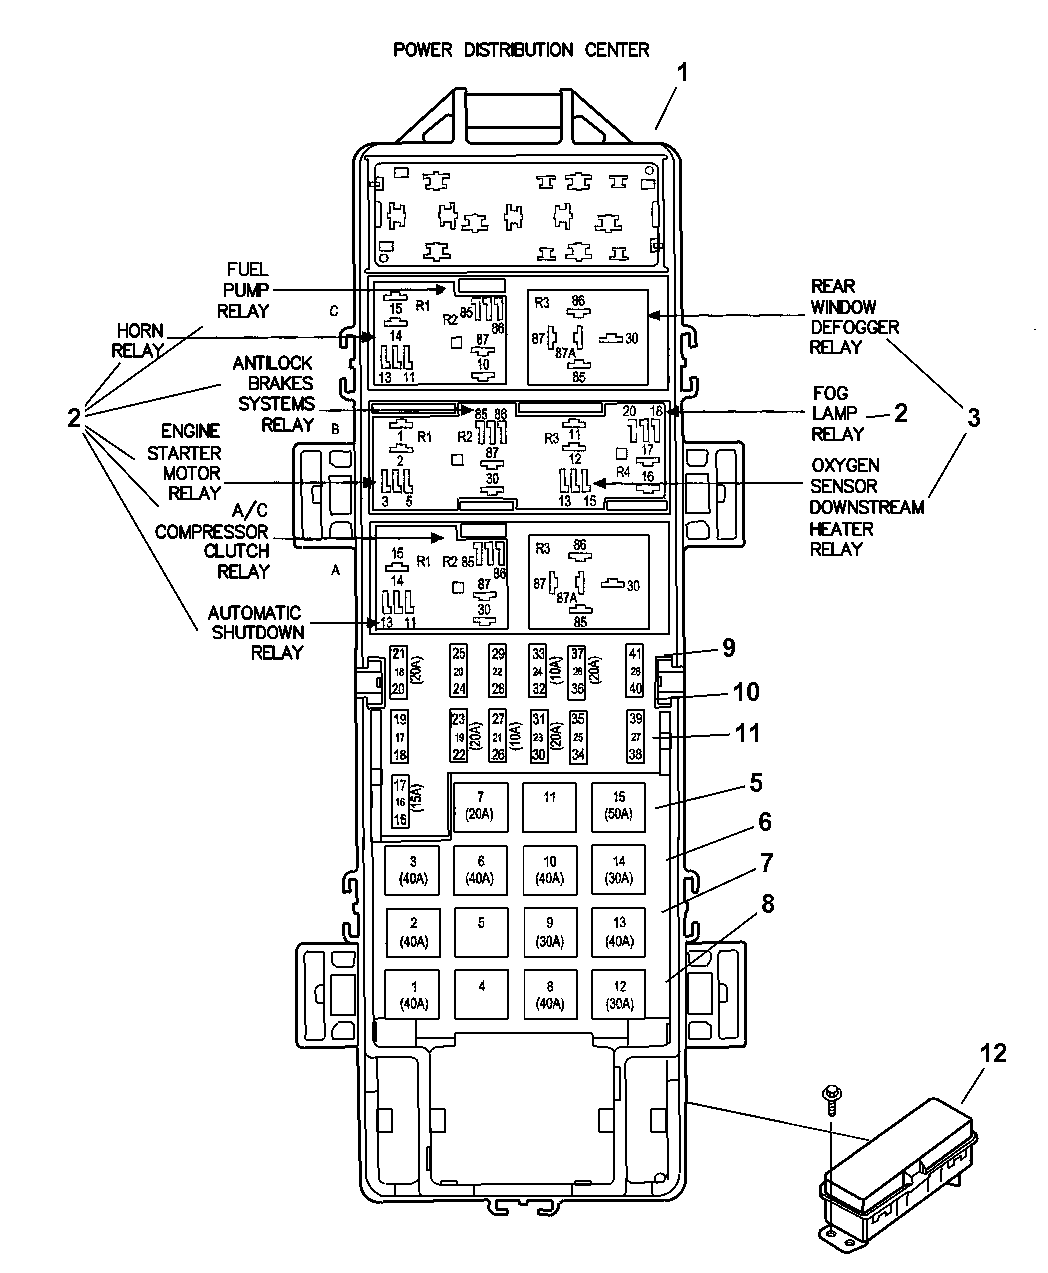 2005 jeep wrangler power distribution center relay \u0026 fuses 2008 Jeep Wrangler Fuse Diagram